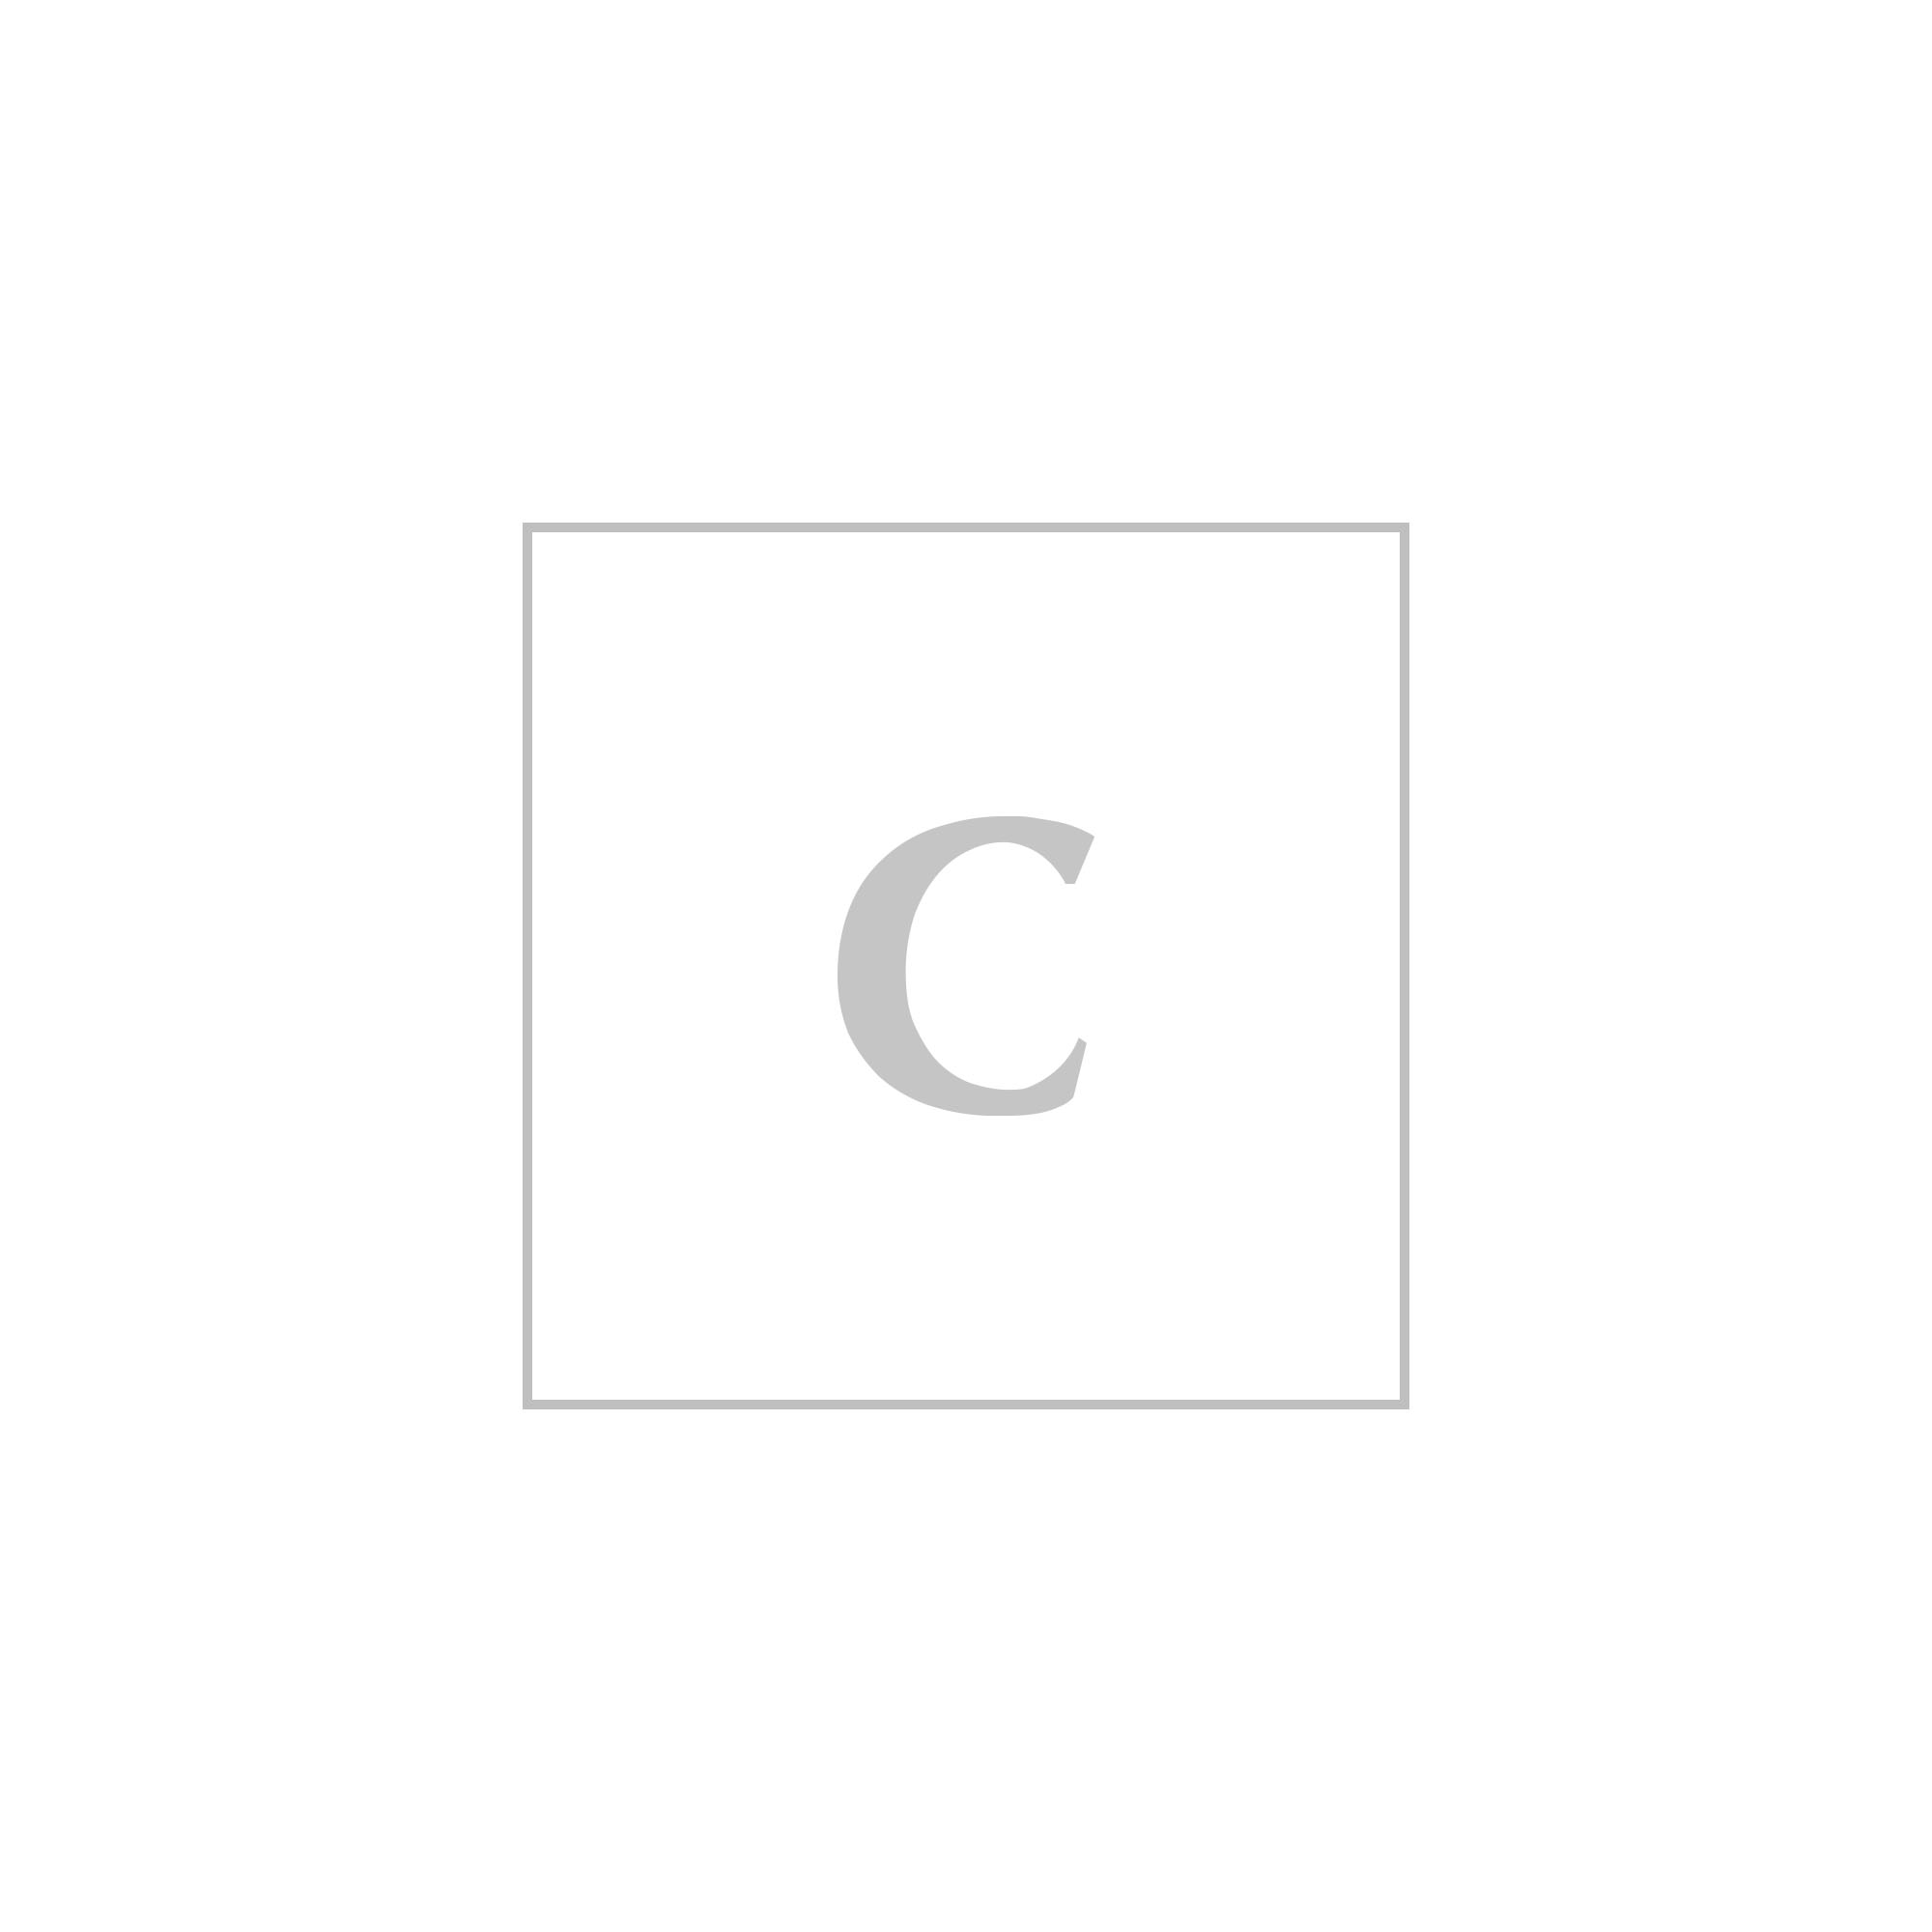 Saint laurent ysl diamond patent clutch